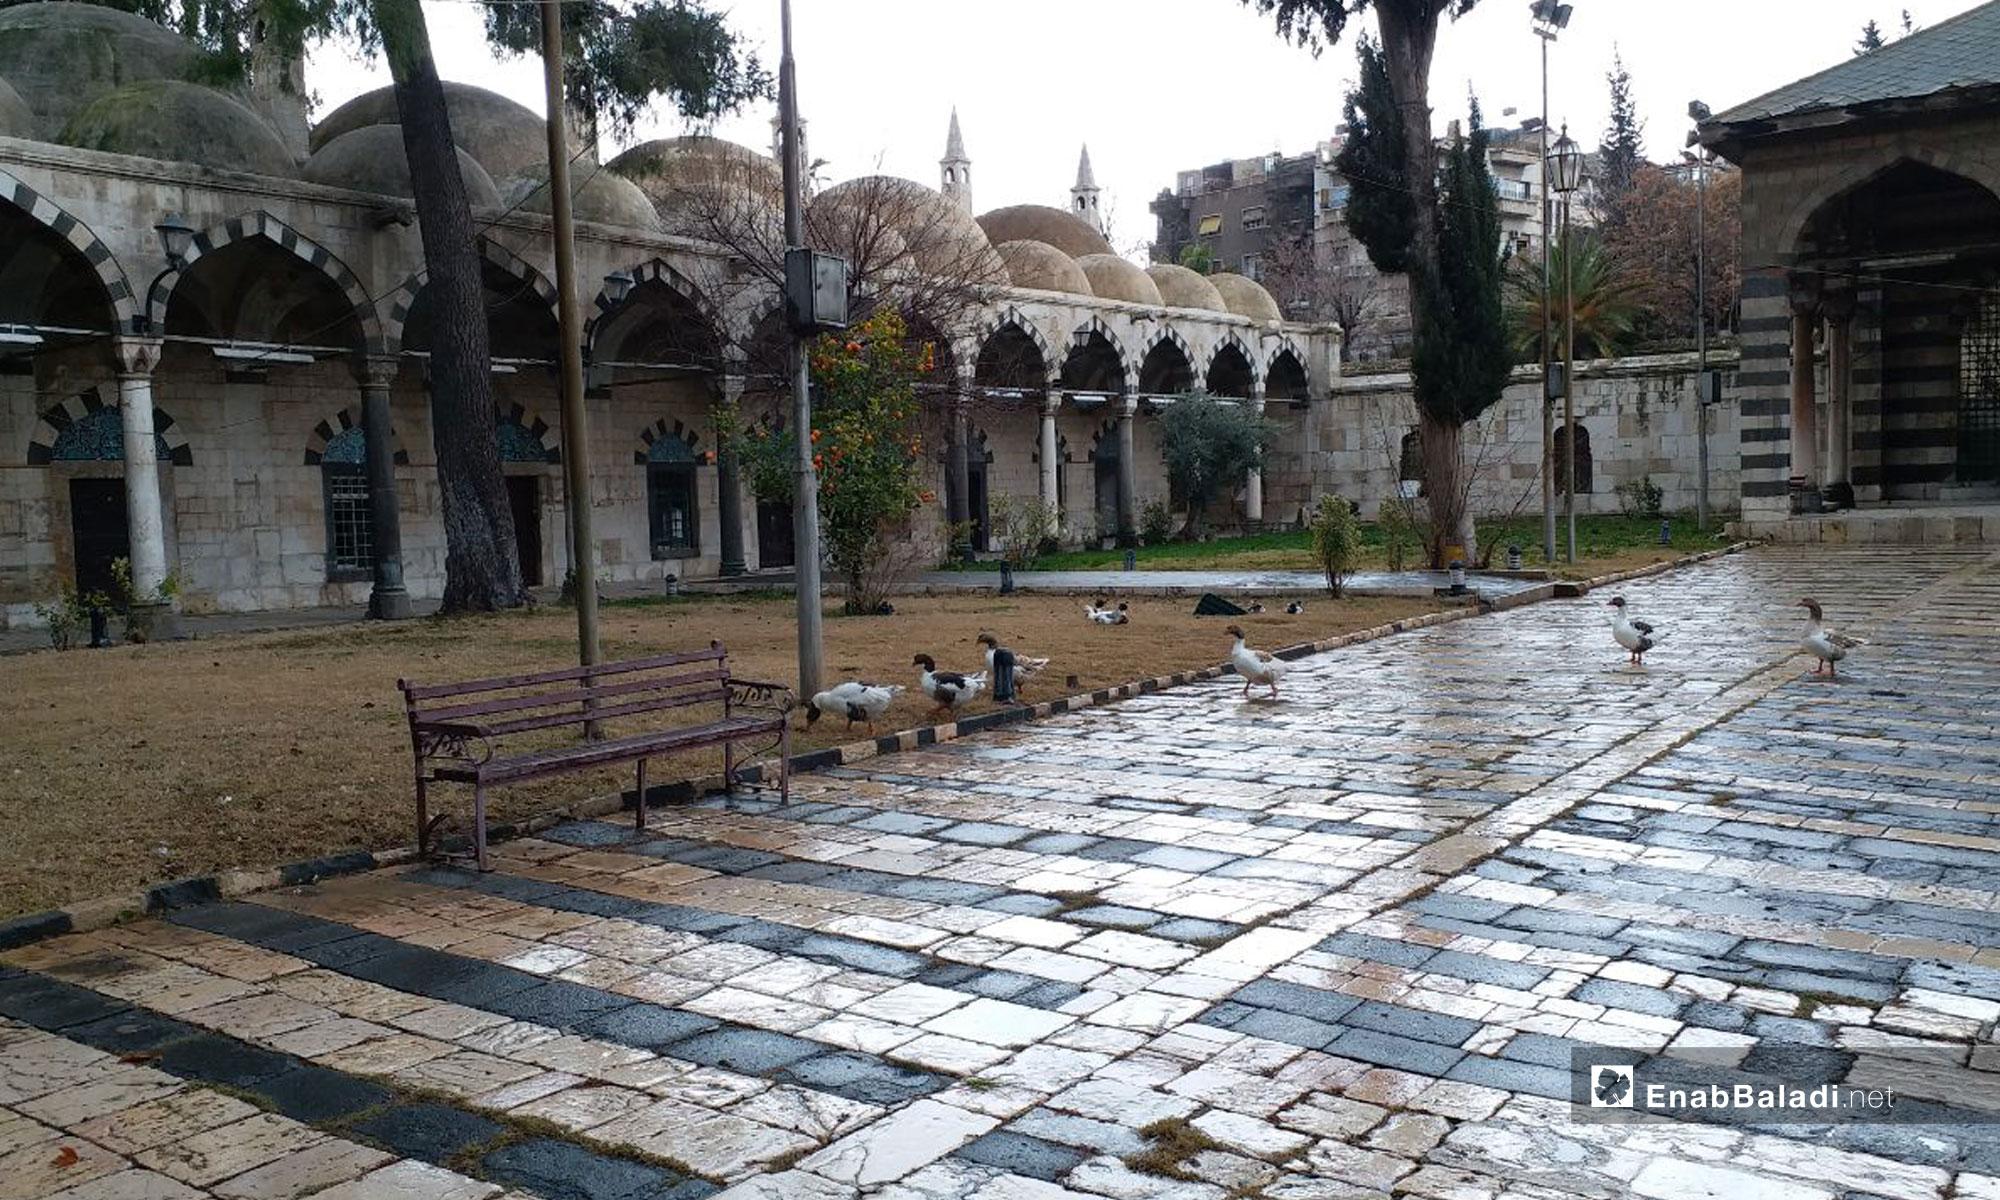 The yard of the National Museum, Damascus - January 12, 2019 (Enab Baladi)